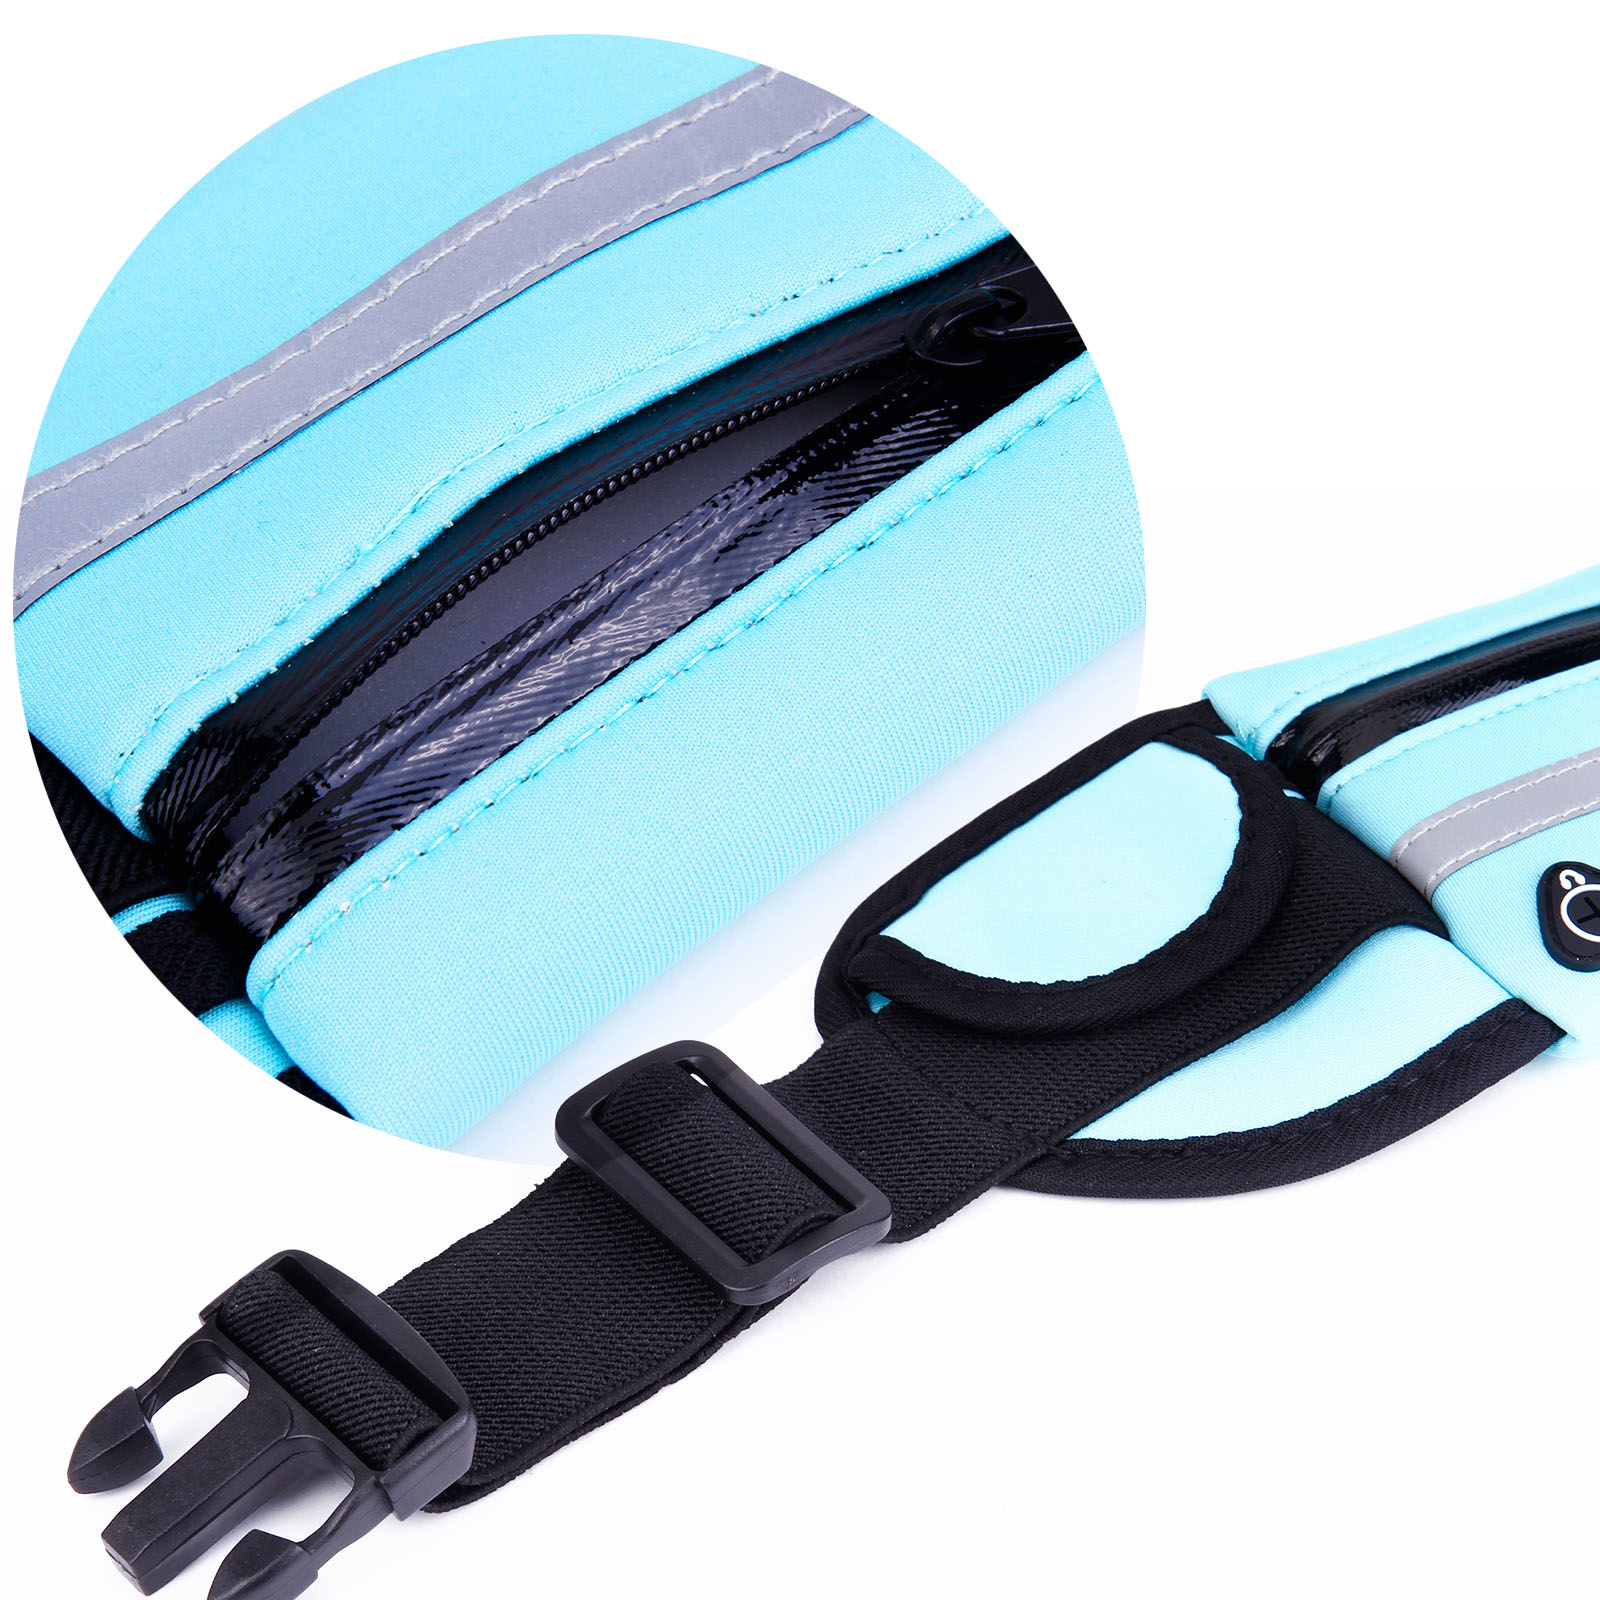 bleu sac banane ceinture de voyage portefeuille course sport pochette mobile ebay. Black Bedroom Furniture Sets. Home Design Ideas